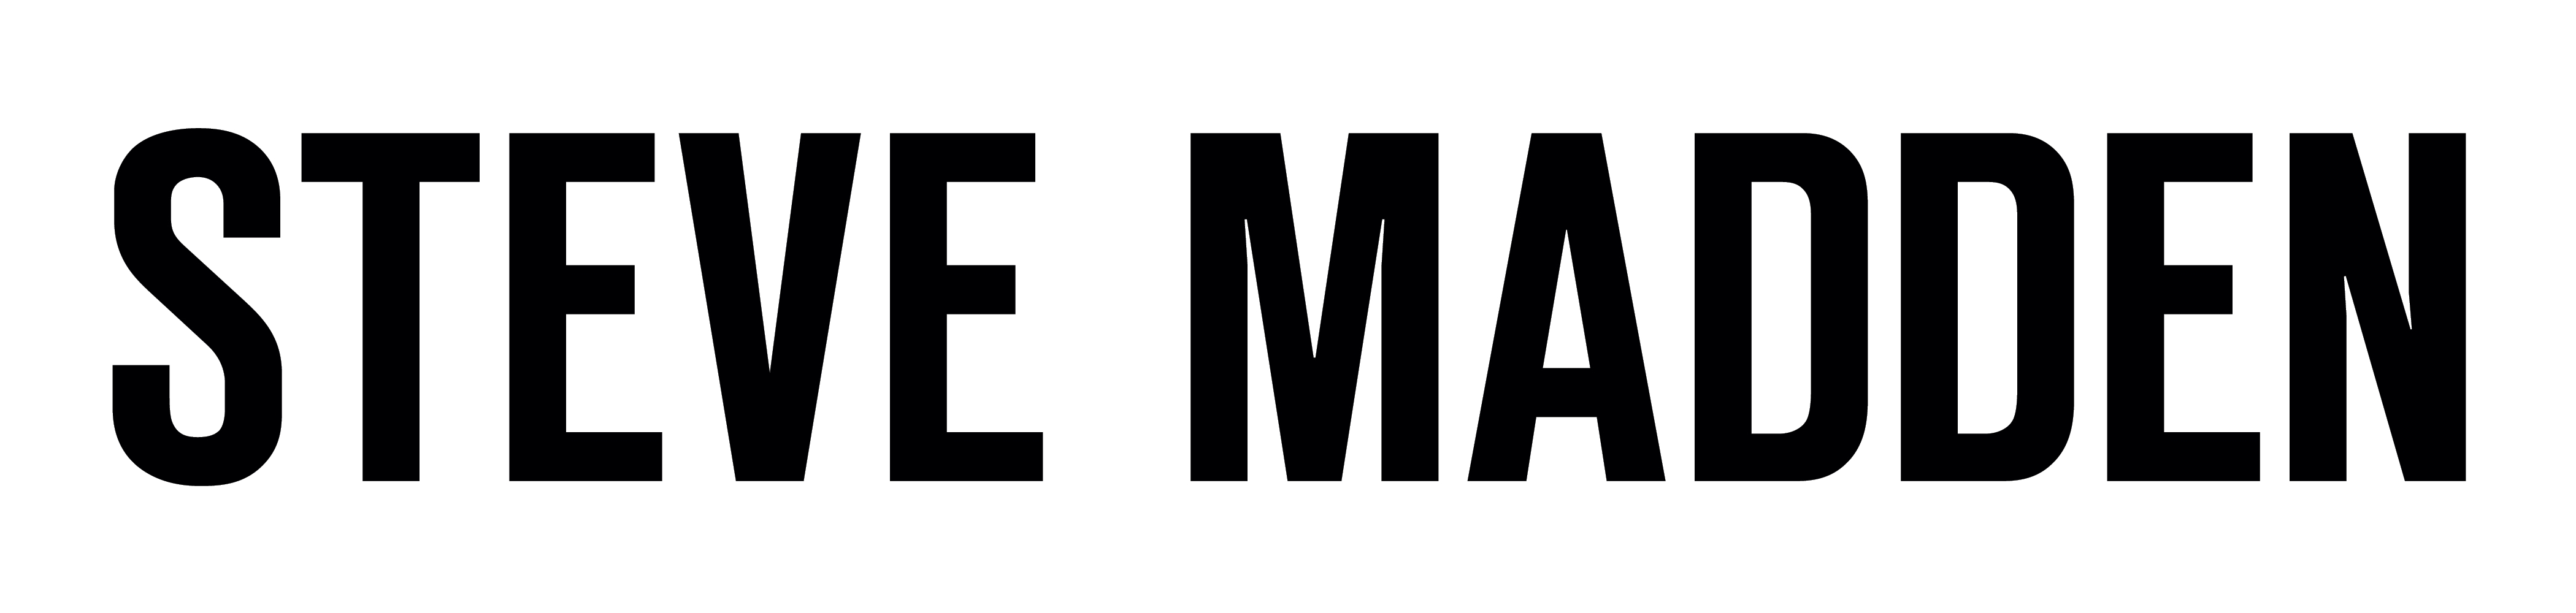 Steve Madden Logos Download